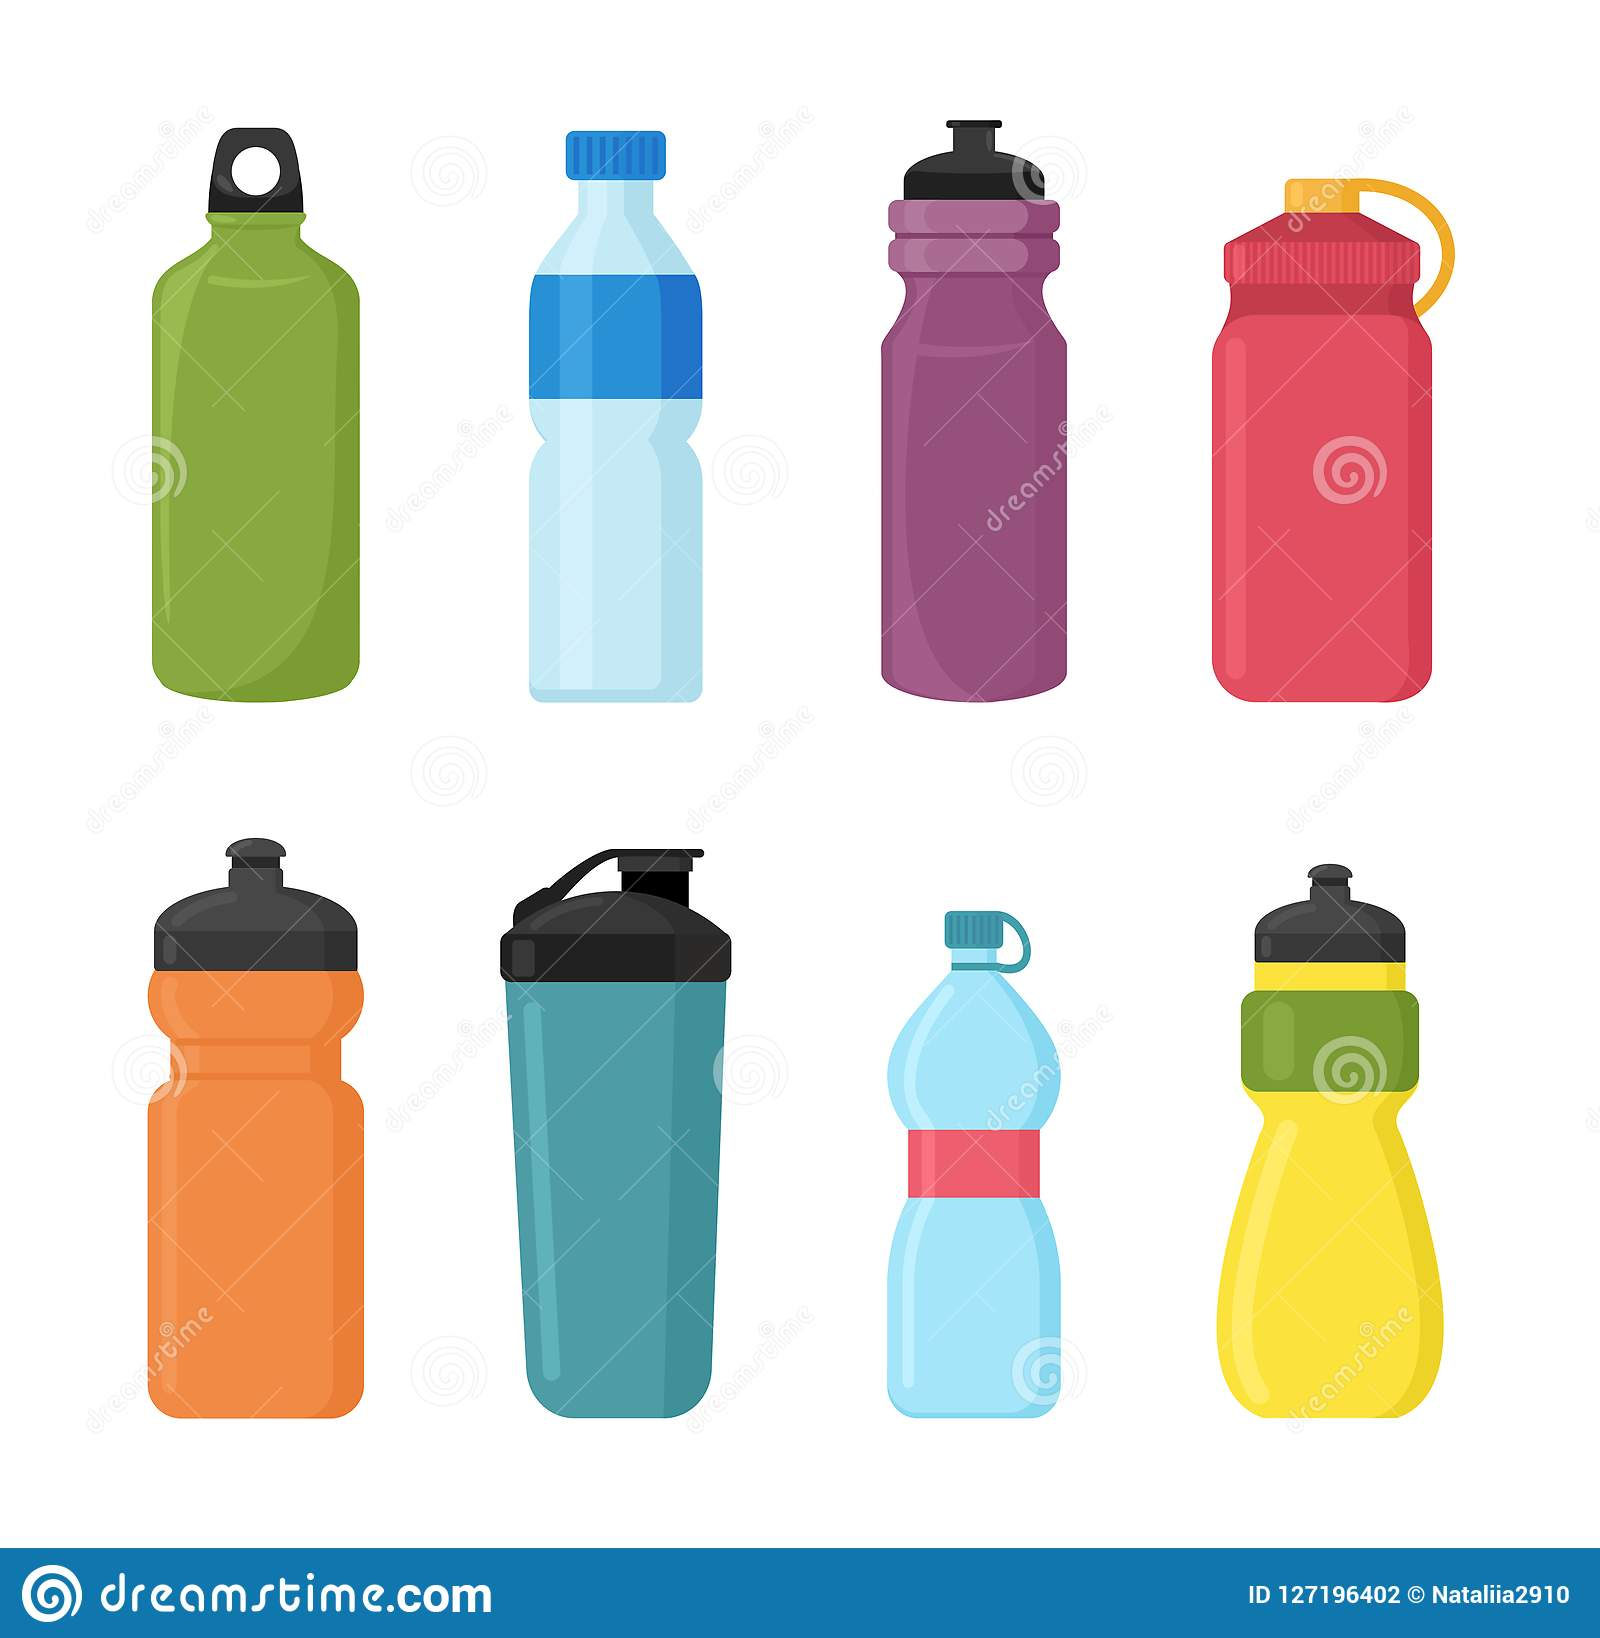 Water Bottle Vector: Vector Illustration Set Of Bicycle Plastic Bottle For